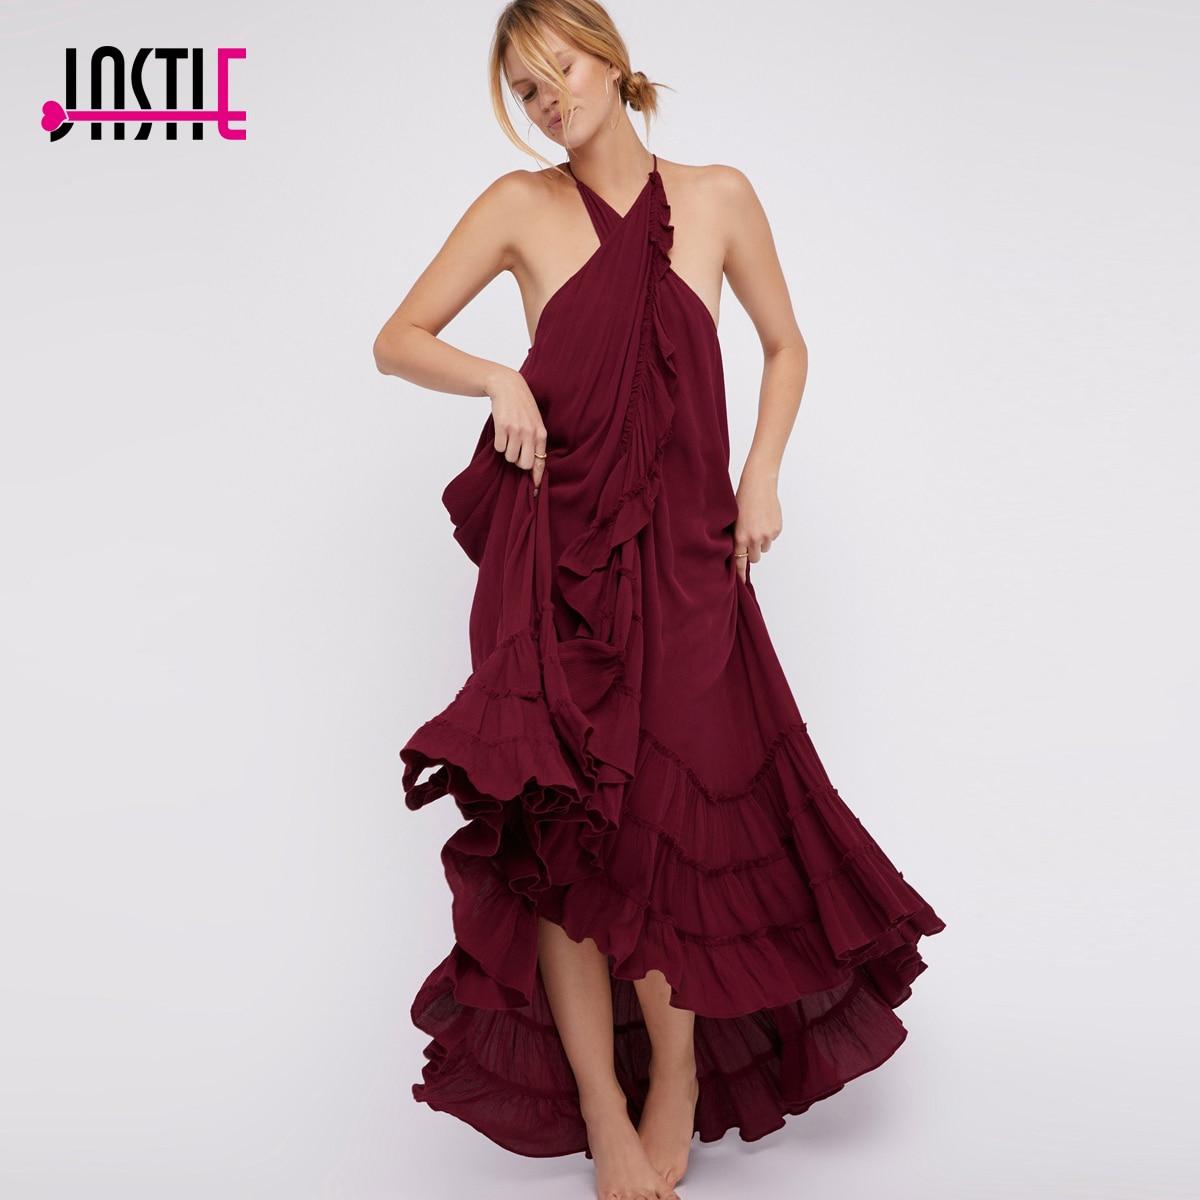 Jastie Shapeless Wrap Around Maxi Dress High Crisscrossed